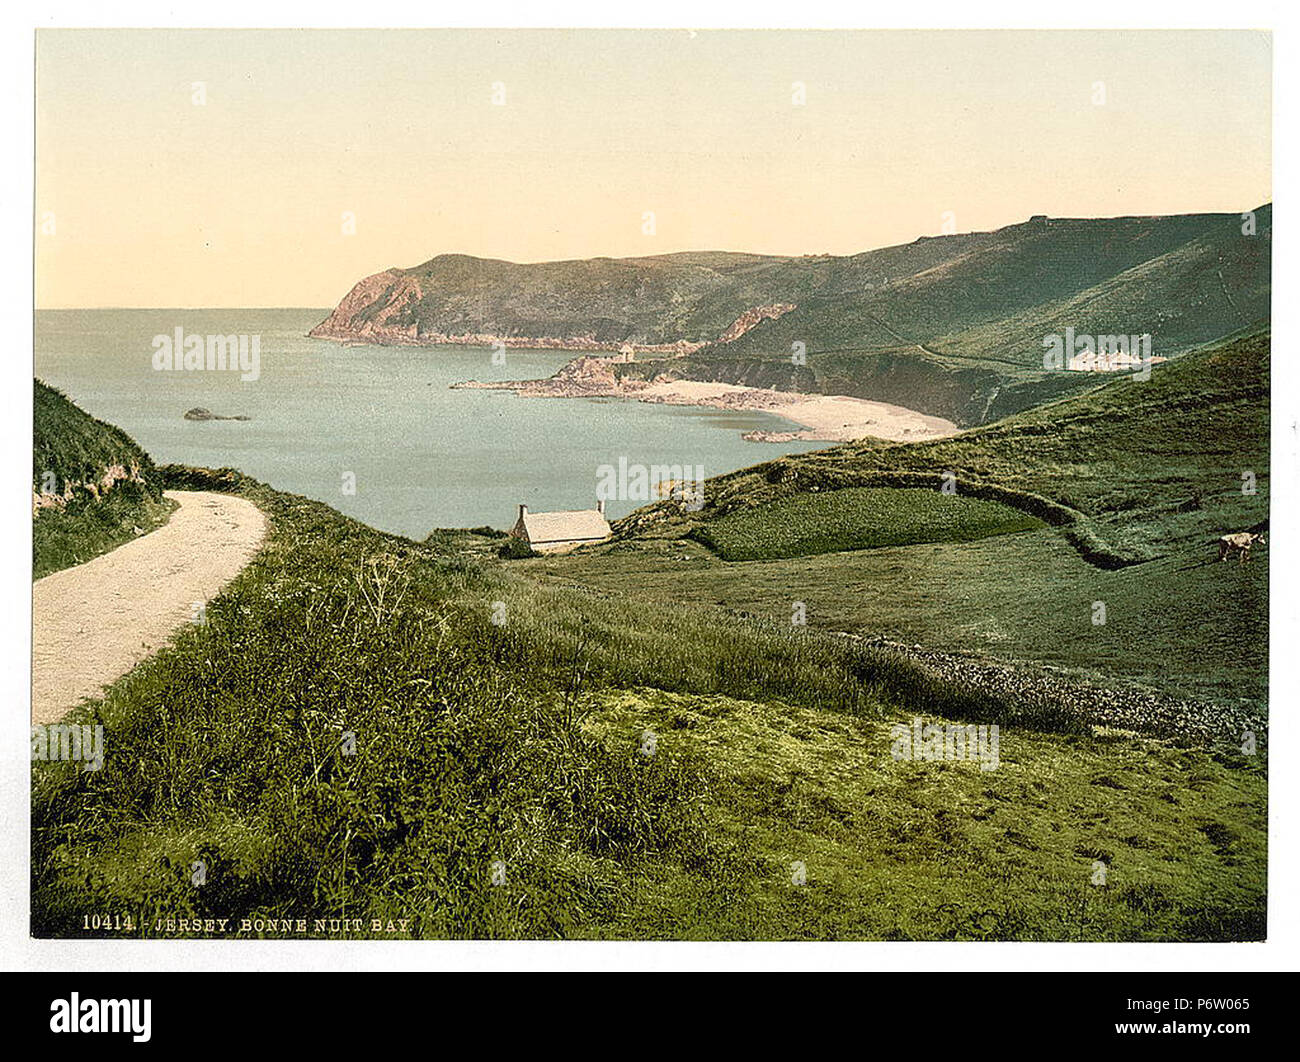 vintage photo nature photography - Stock Image